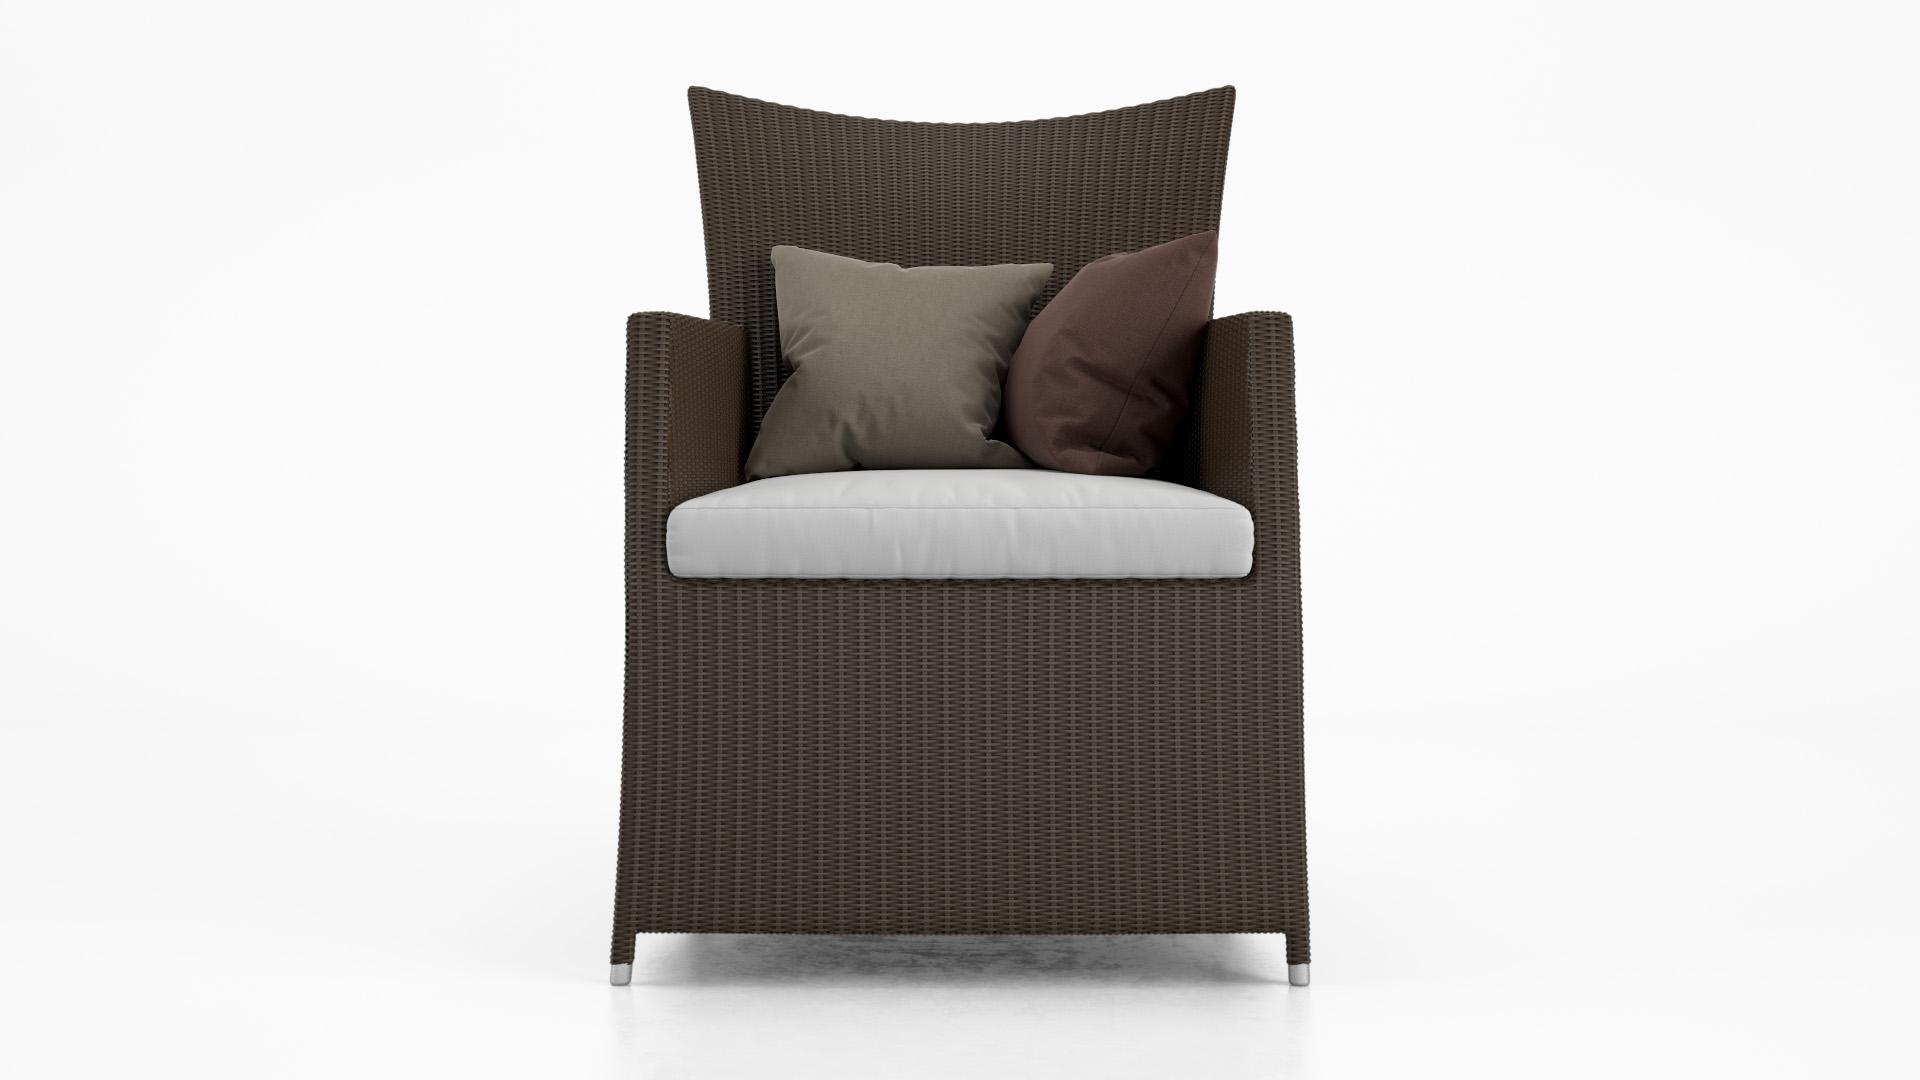 U-zit_Chair_CF-21-DB_WhiteSet_01_0001